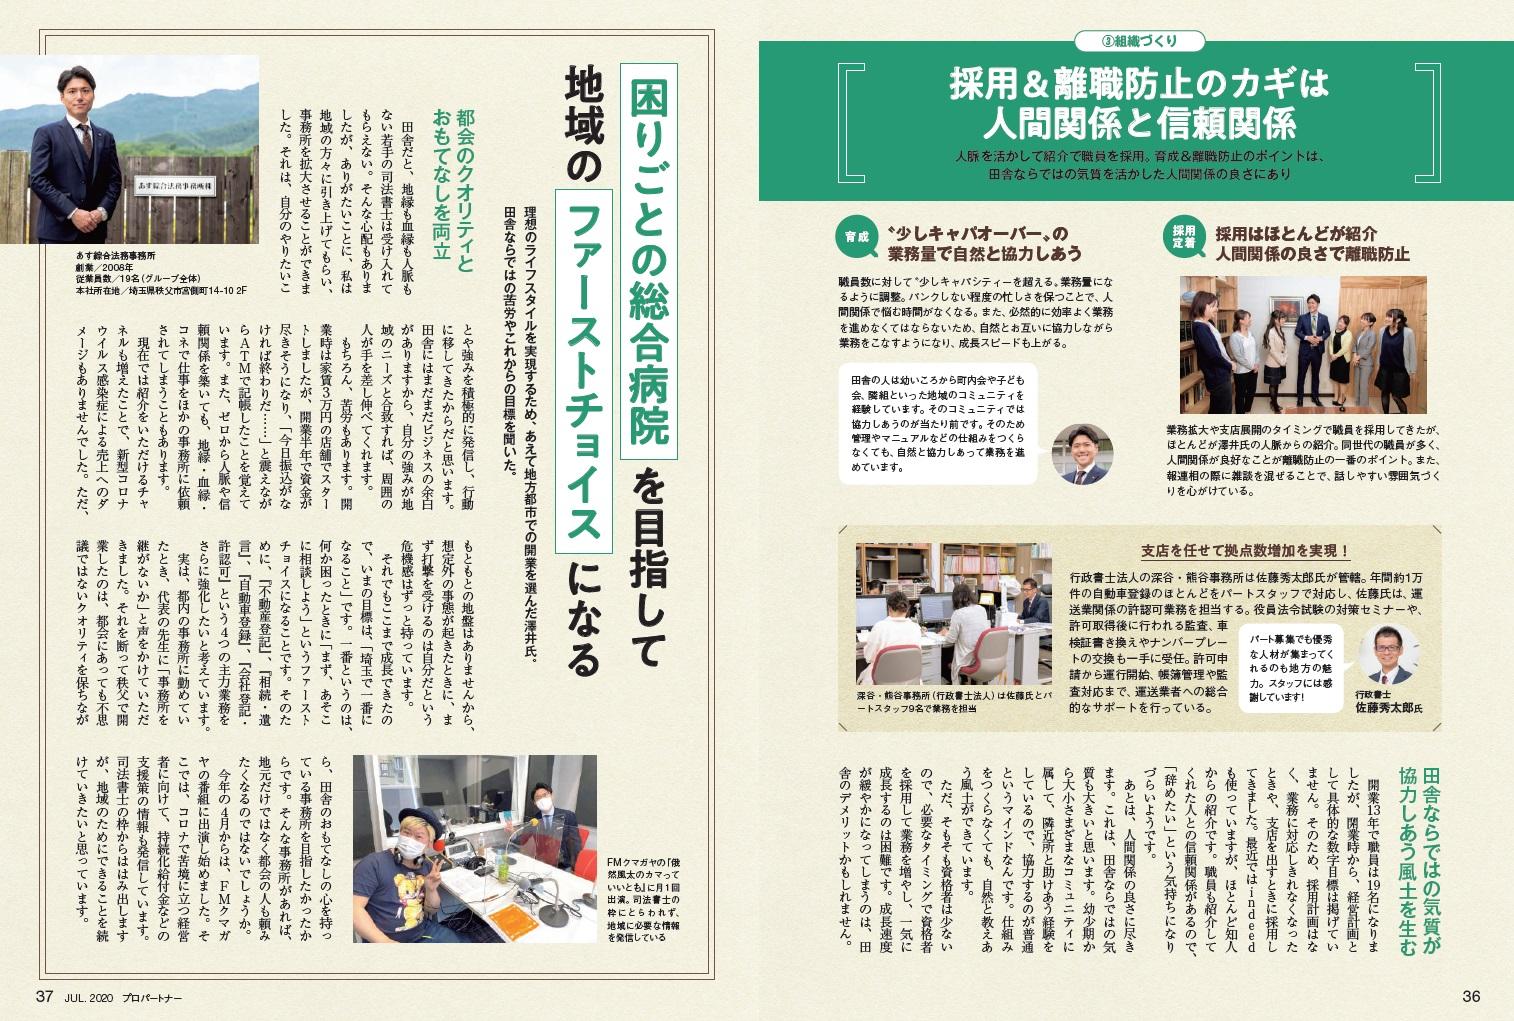 p36-37.jpg